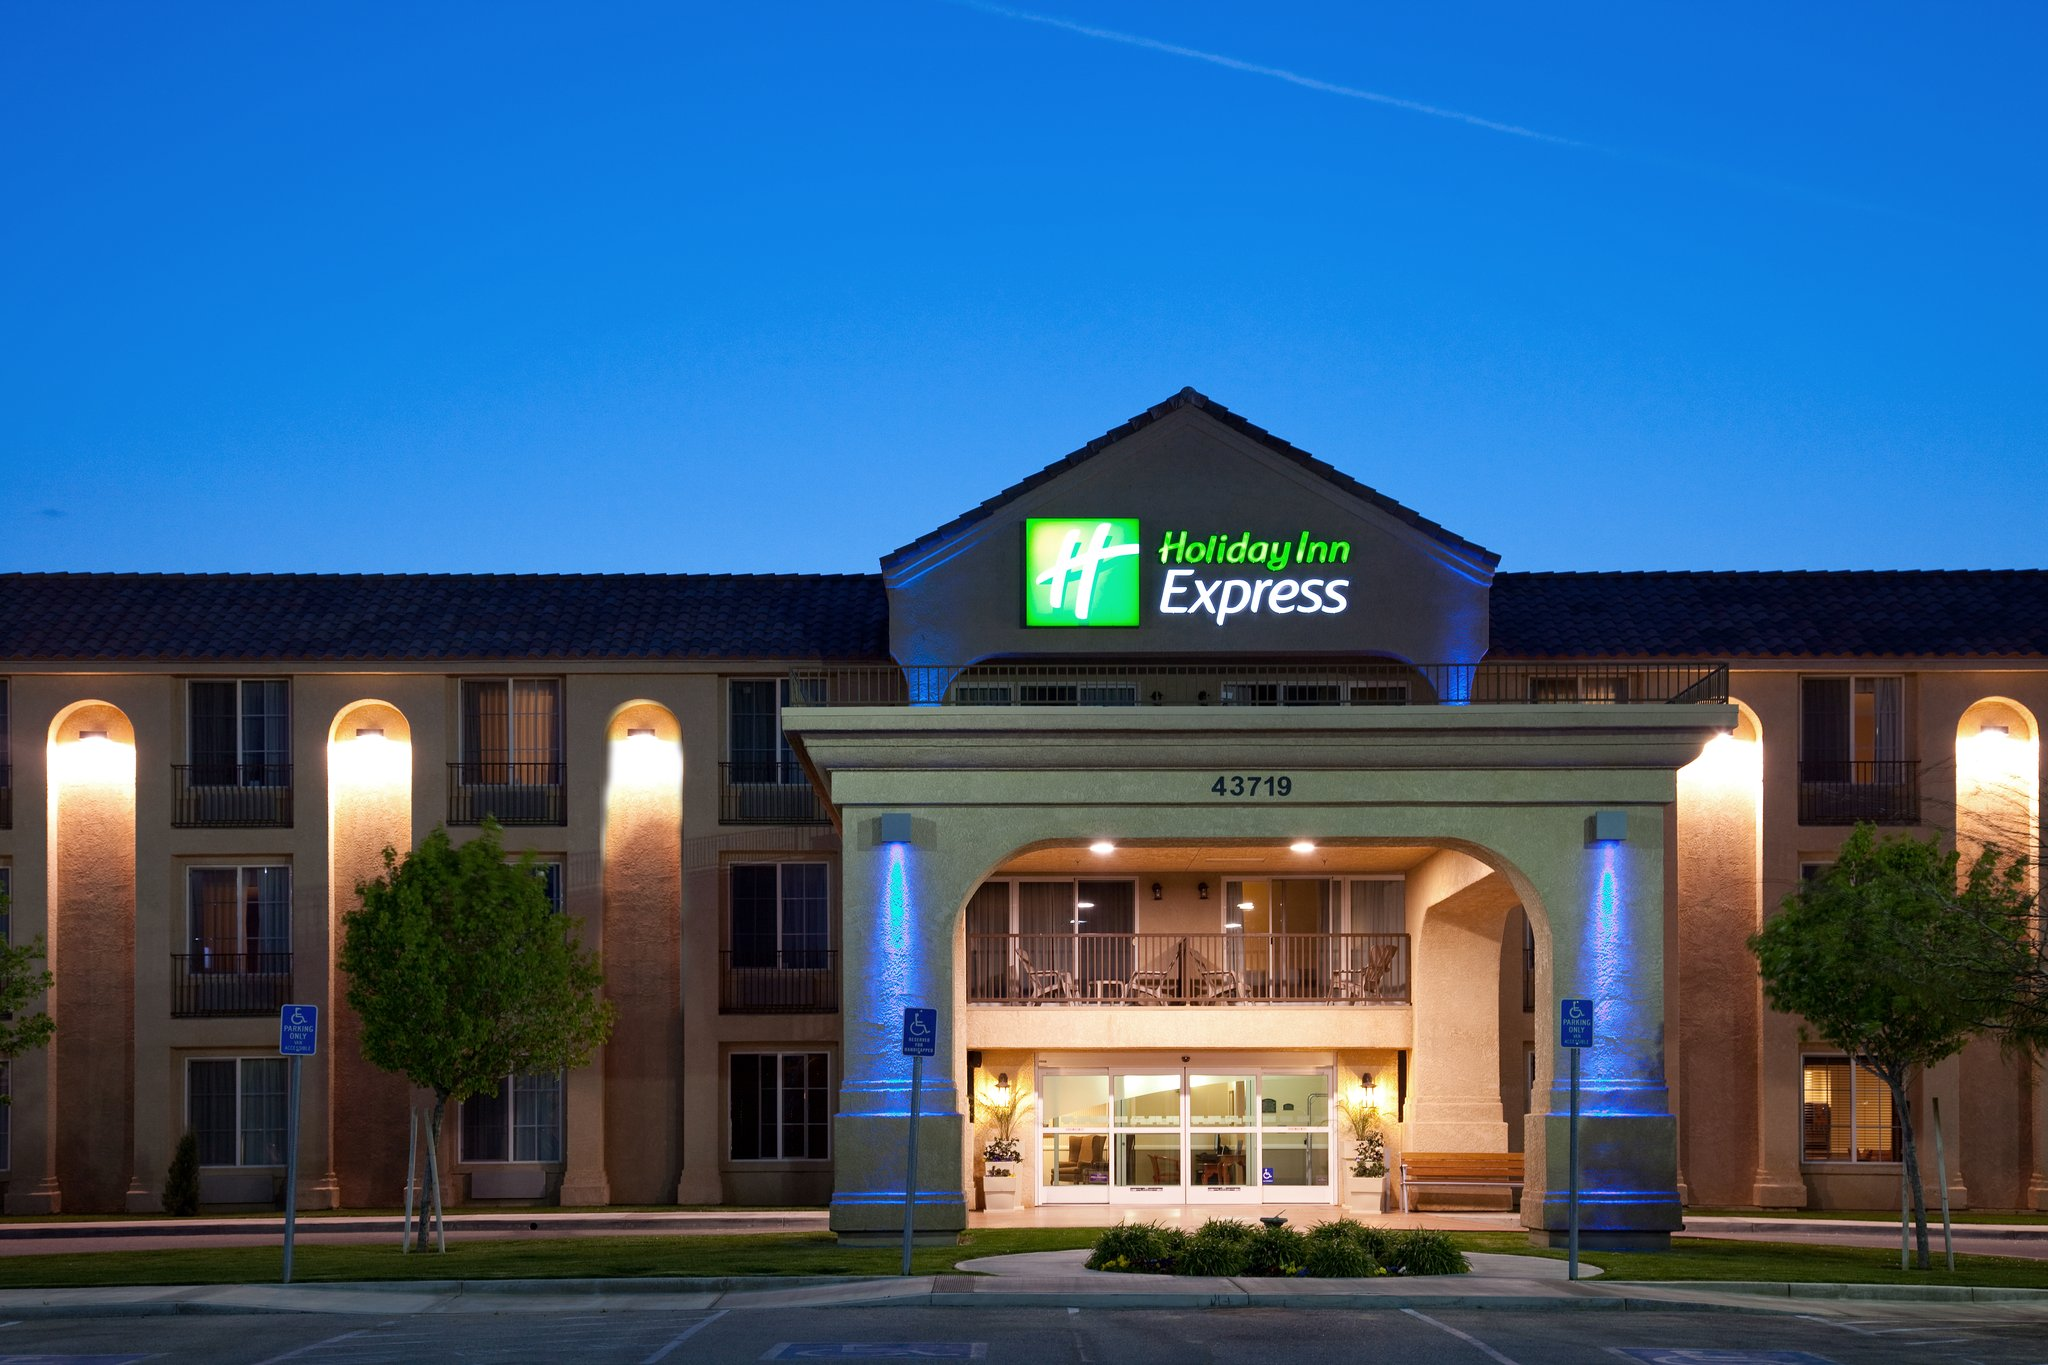 Holiday Inn Express Lancaster